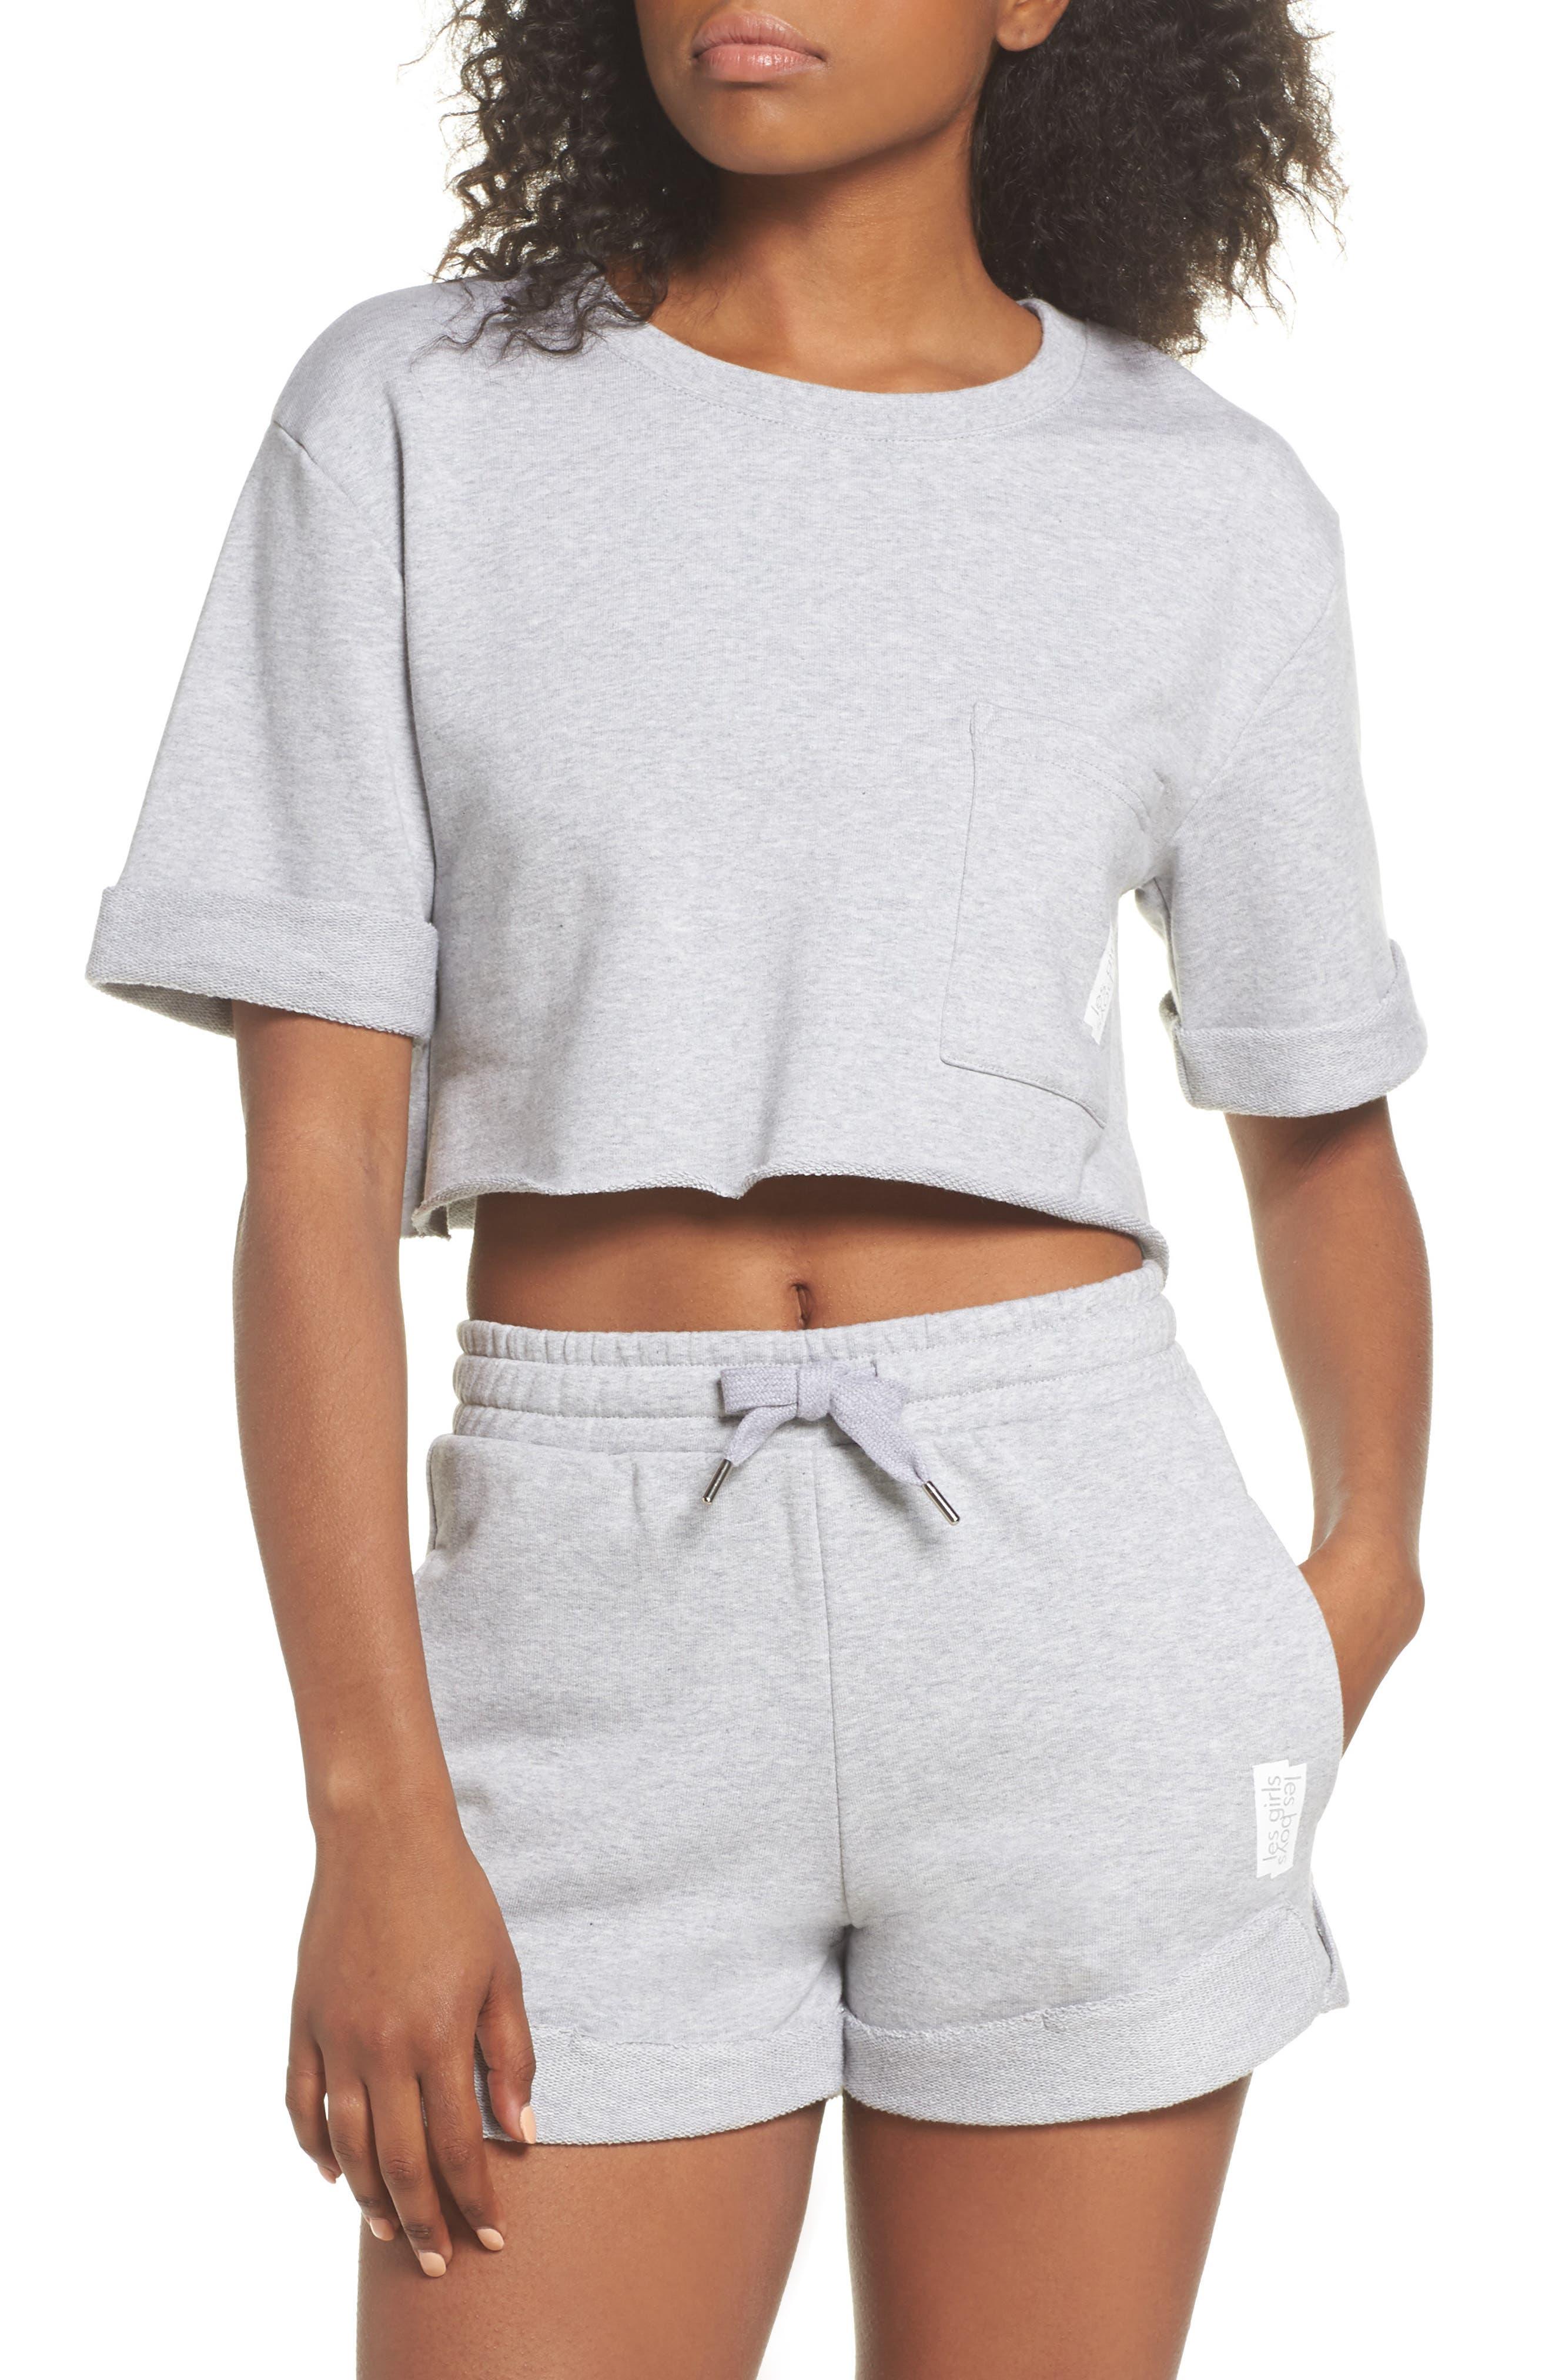 French Terry Crop Sweatshirt,                             Main thumbnail 1, color,                             Light Grey Marl